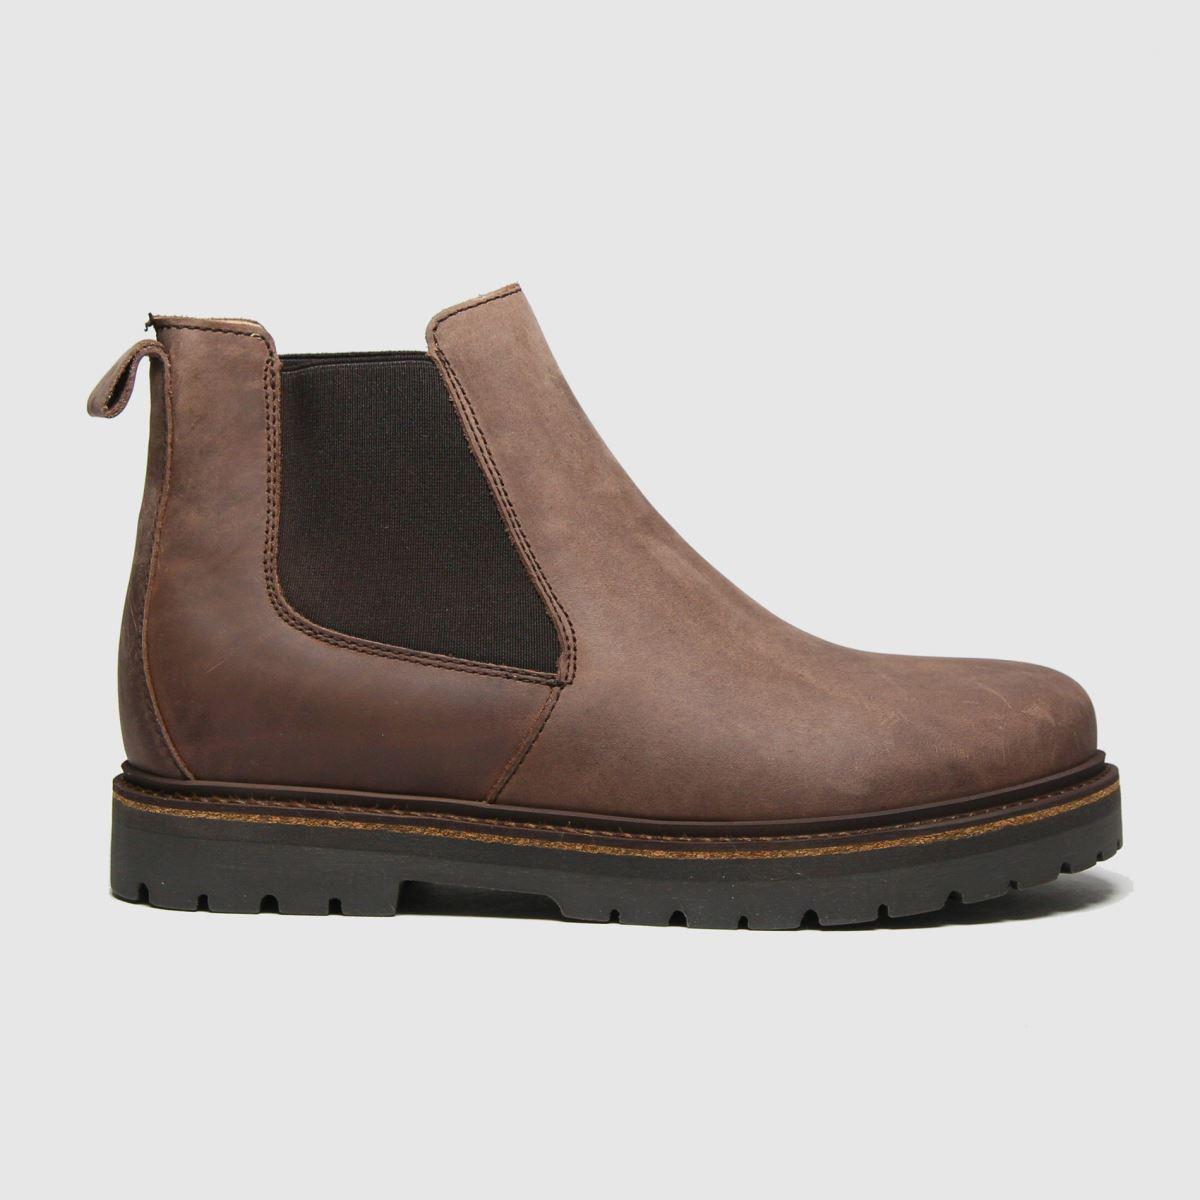 BIRKENSTOCK Brown Stalon Boots